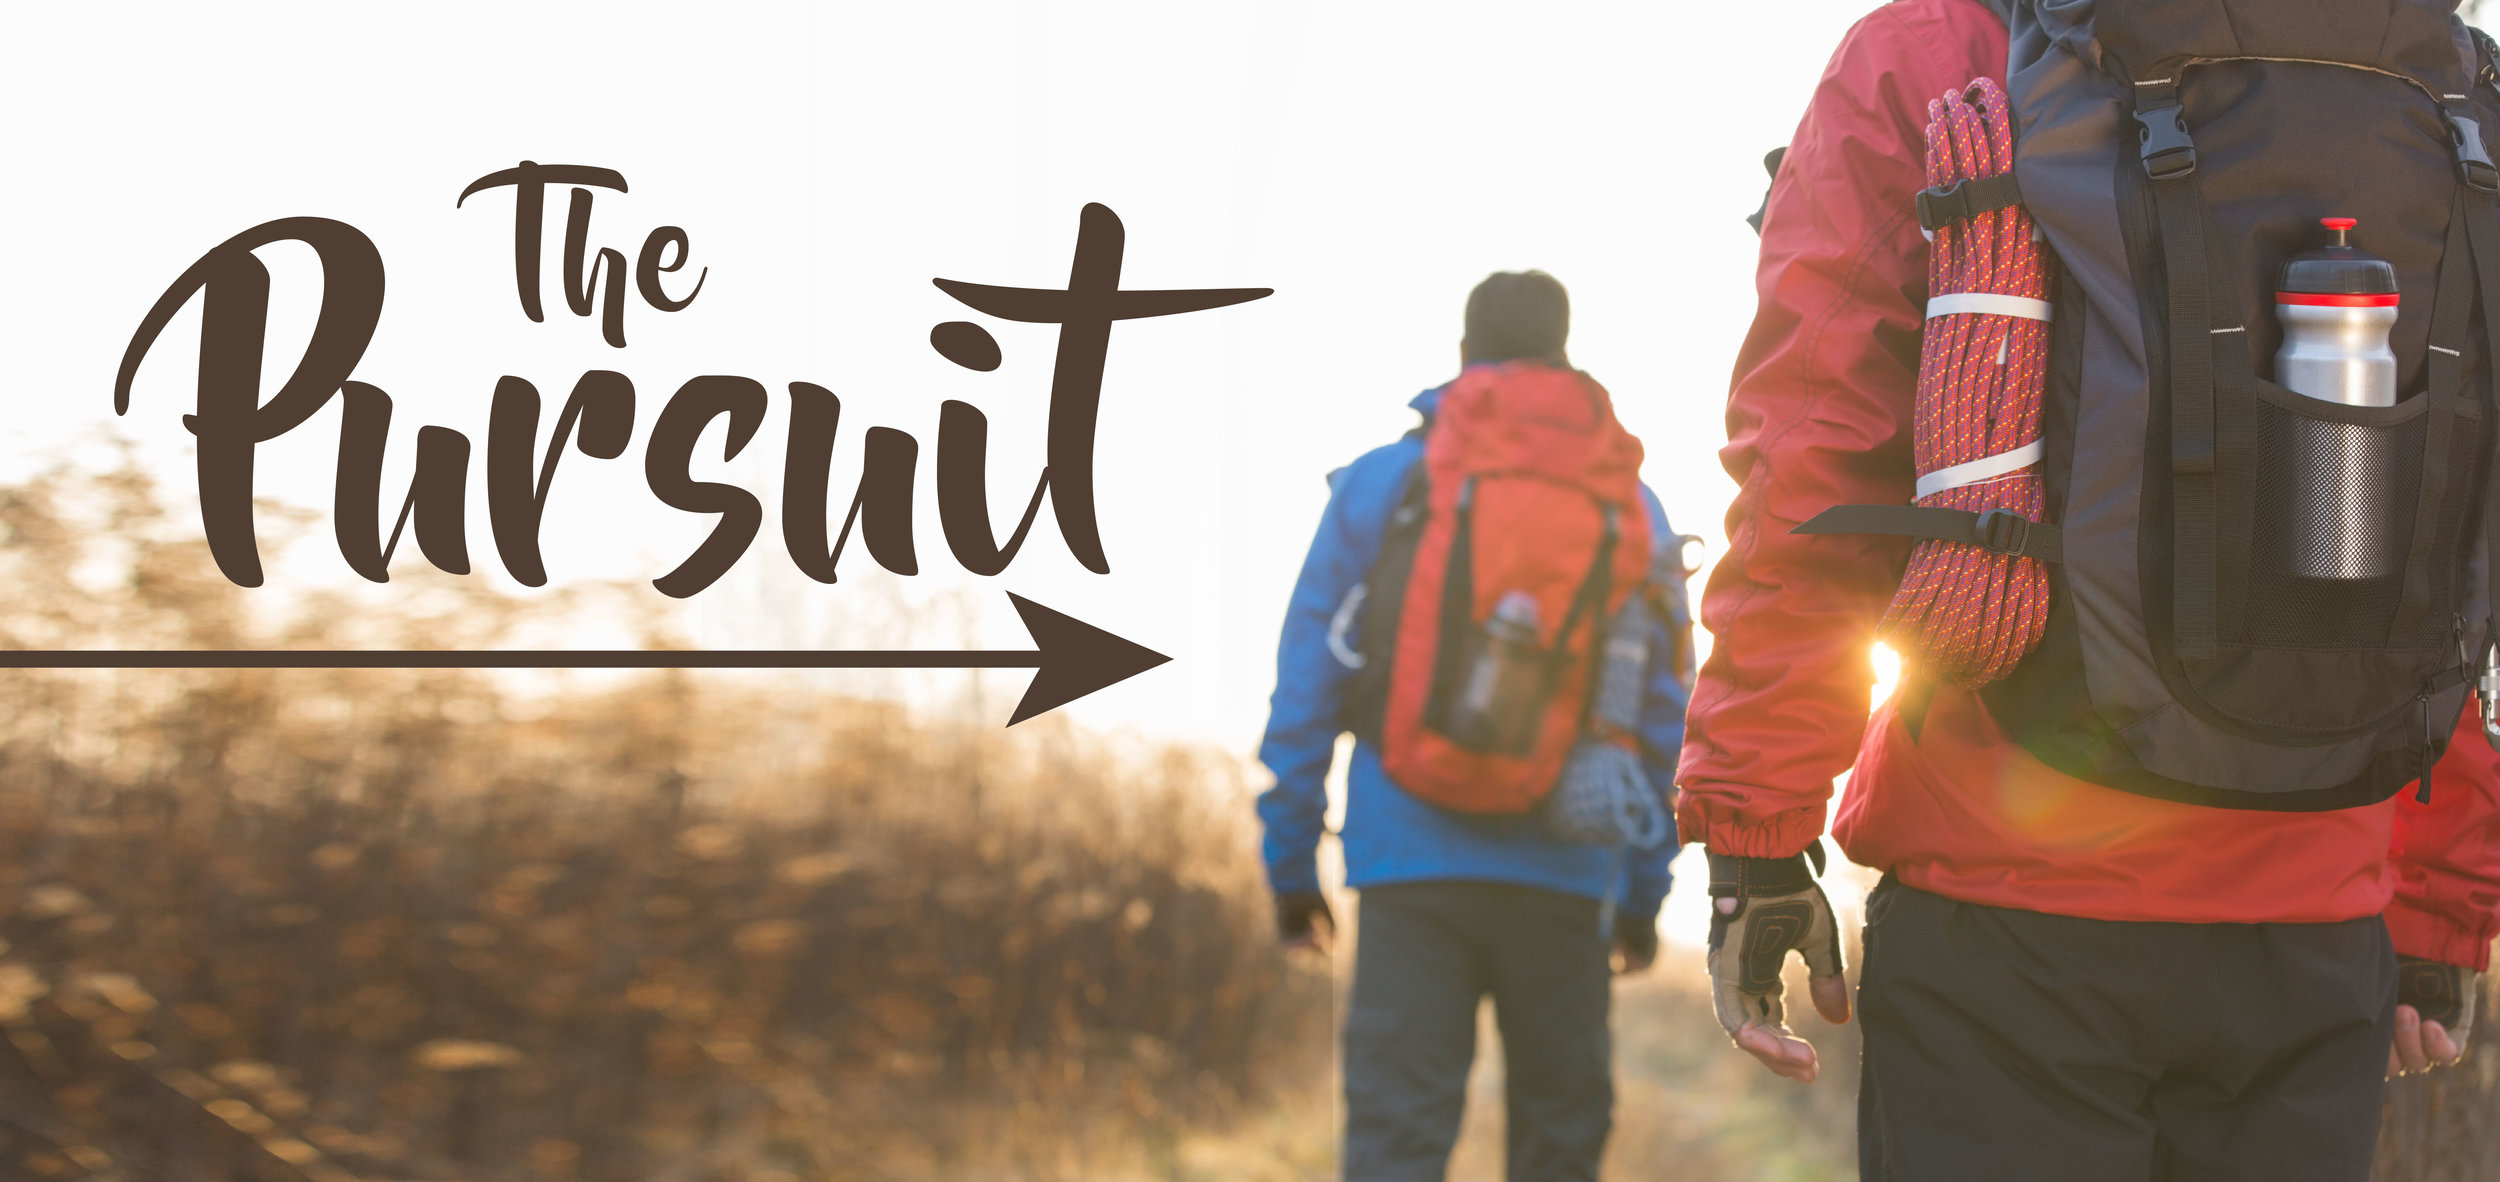 The-Pursuit.jpg